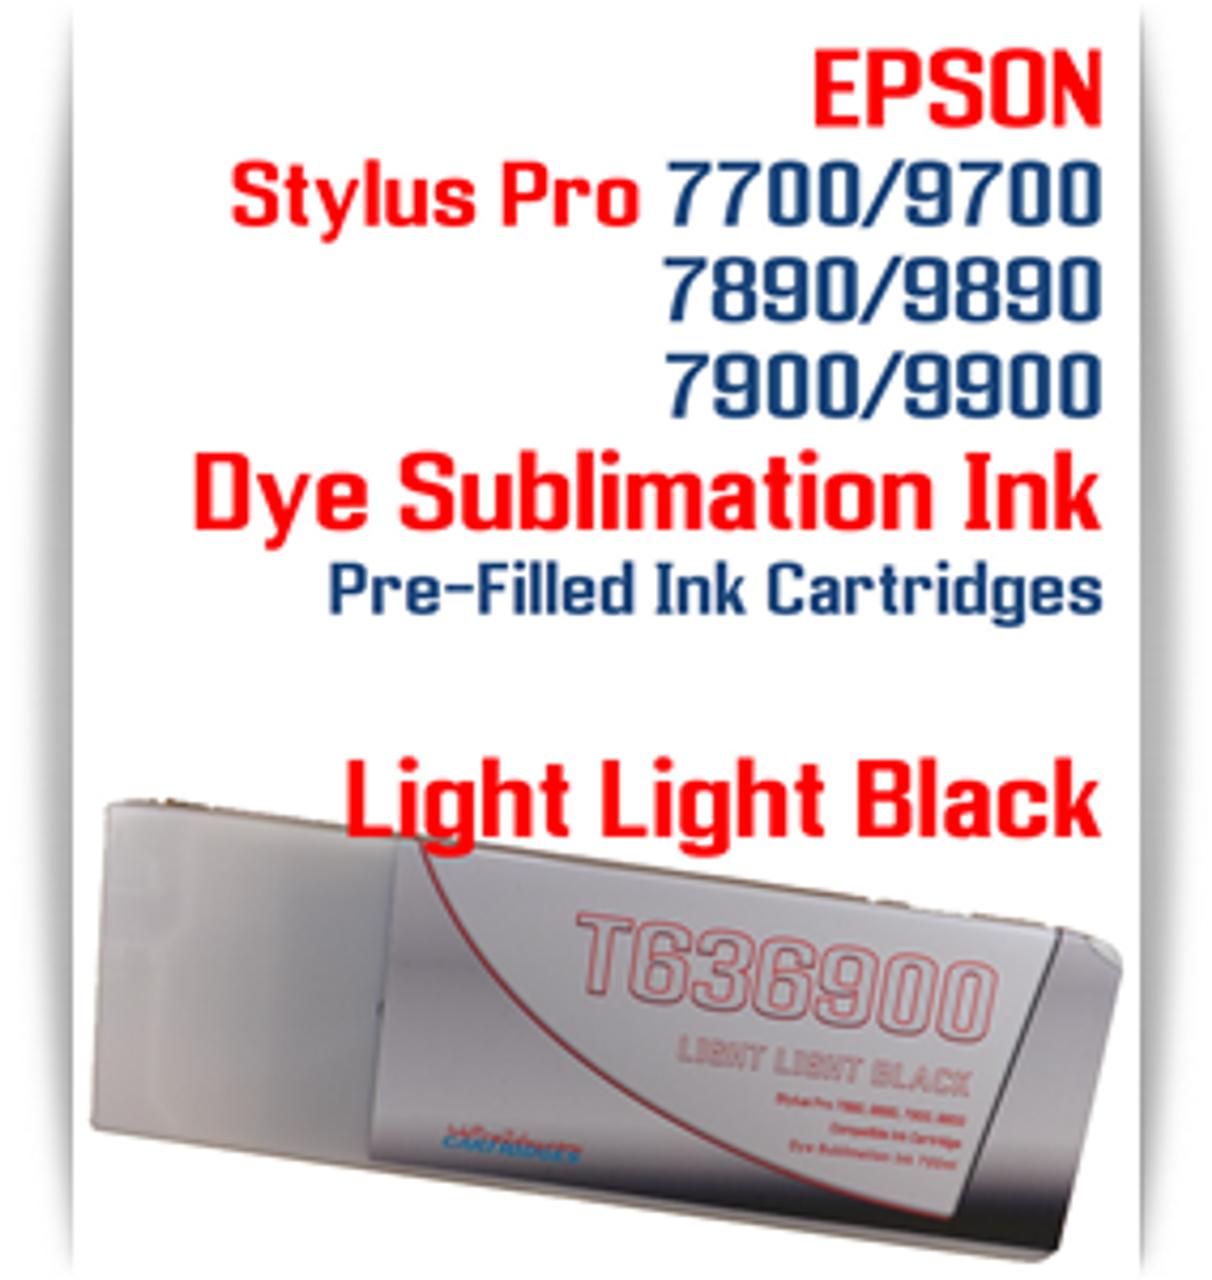 Light Light Black Epson Stylus Pro 7890/9890 Pre-Filled Dye Sublimation Ink Cartridge